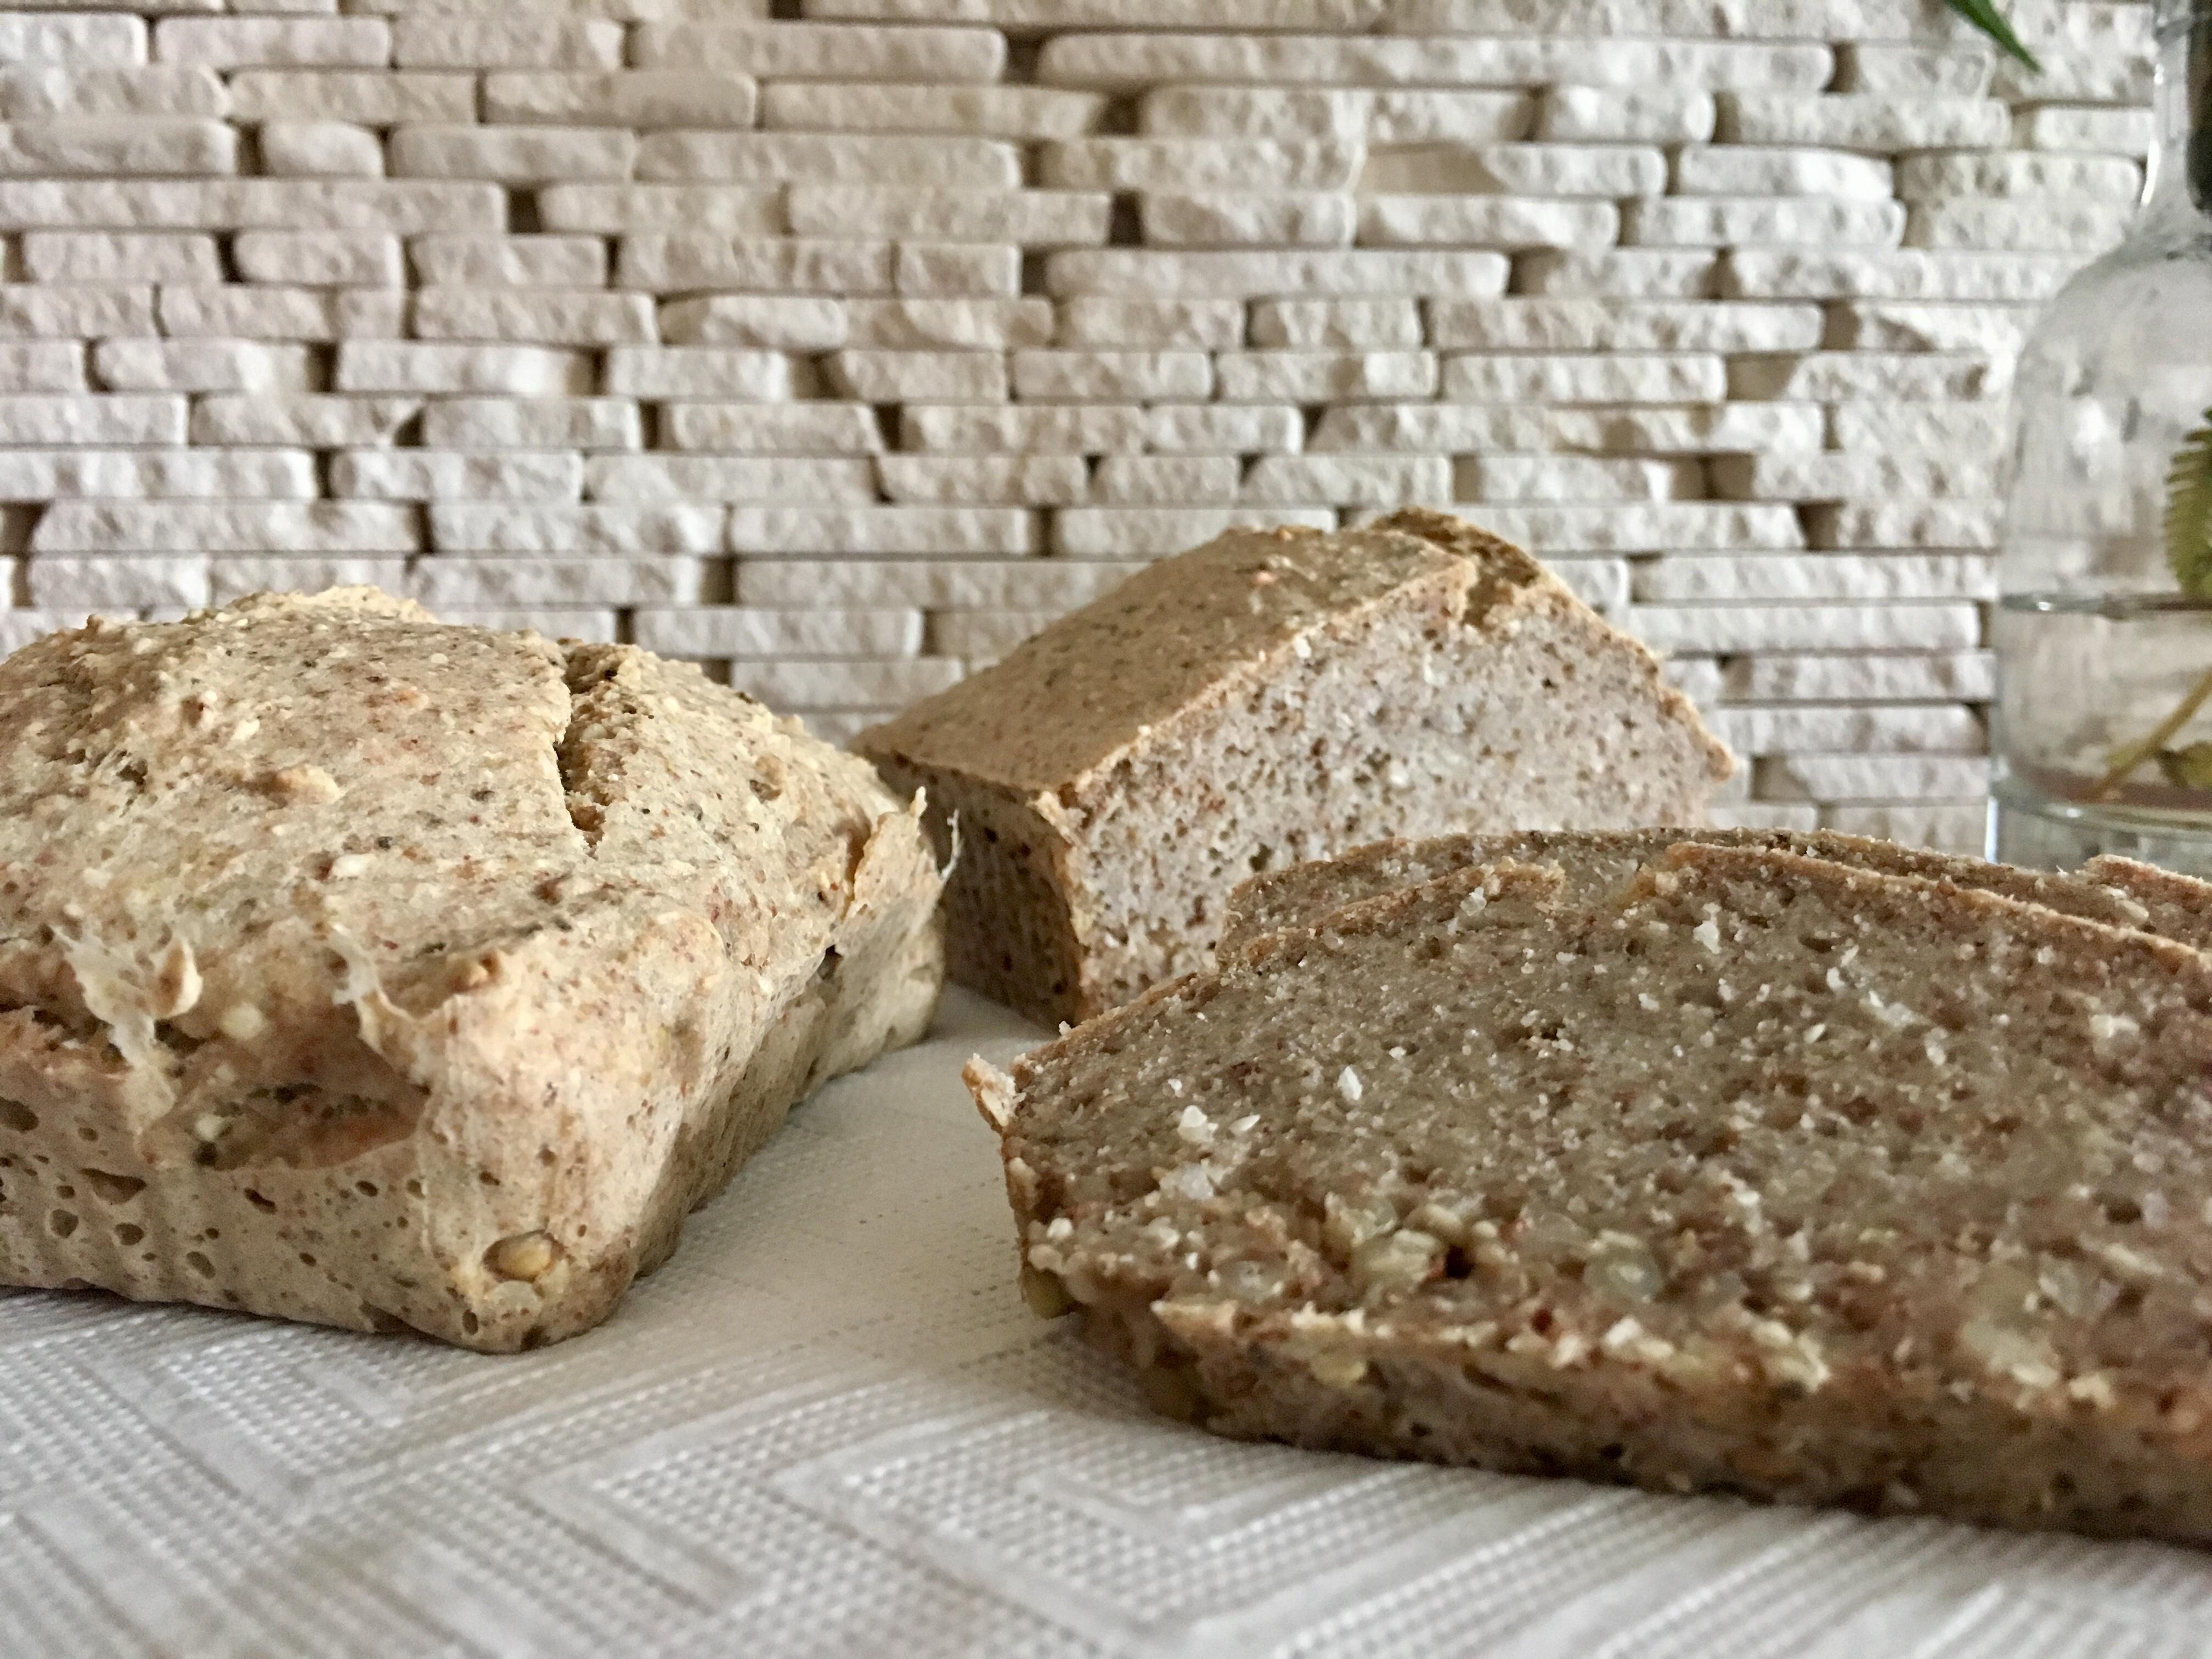 Kruh iz ajdove kaše